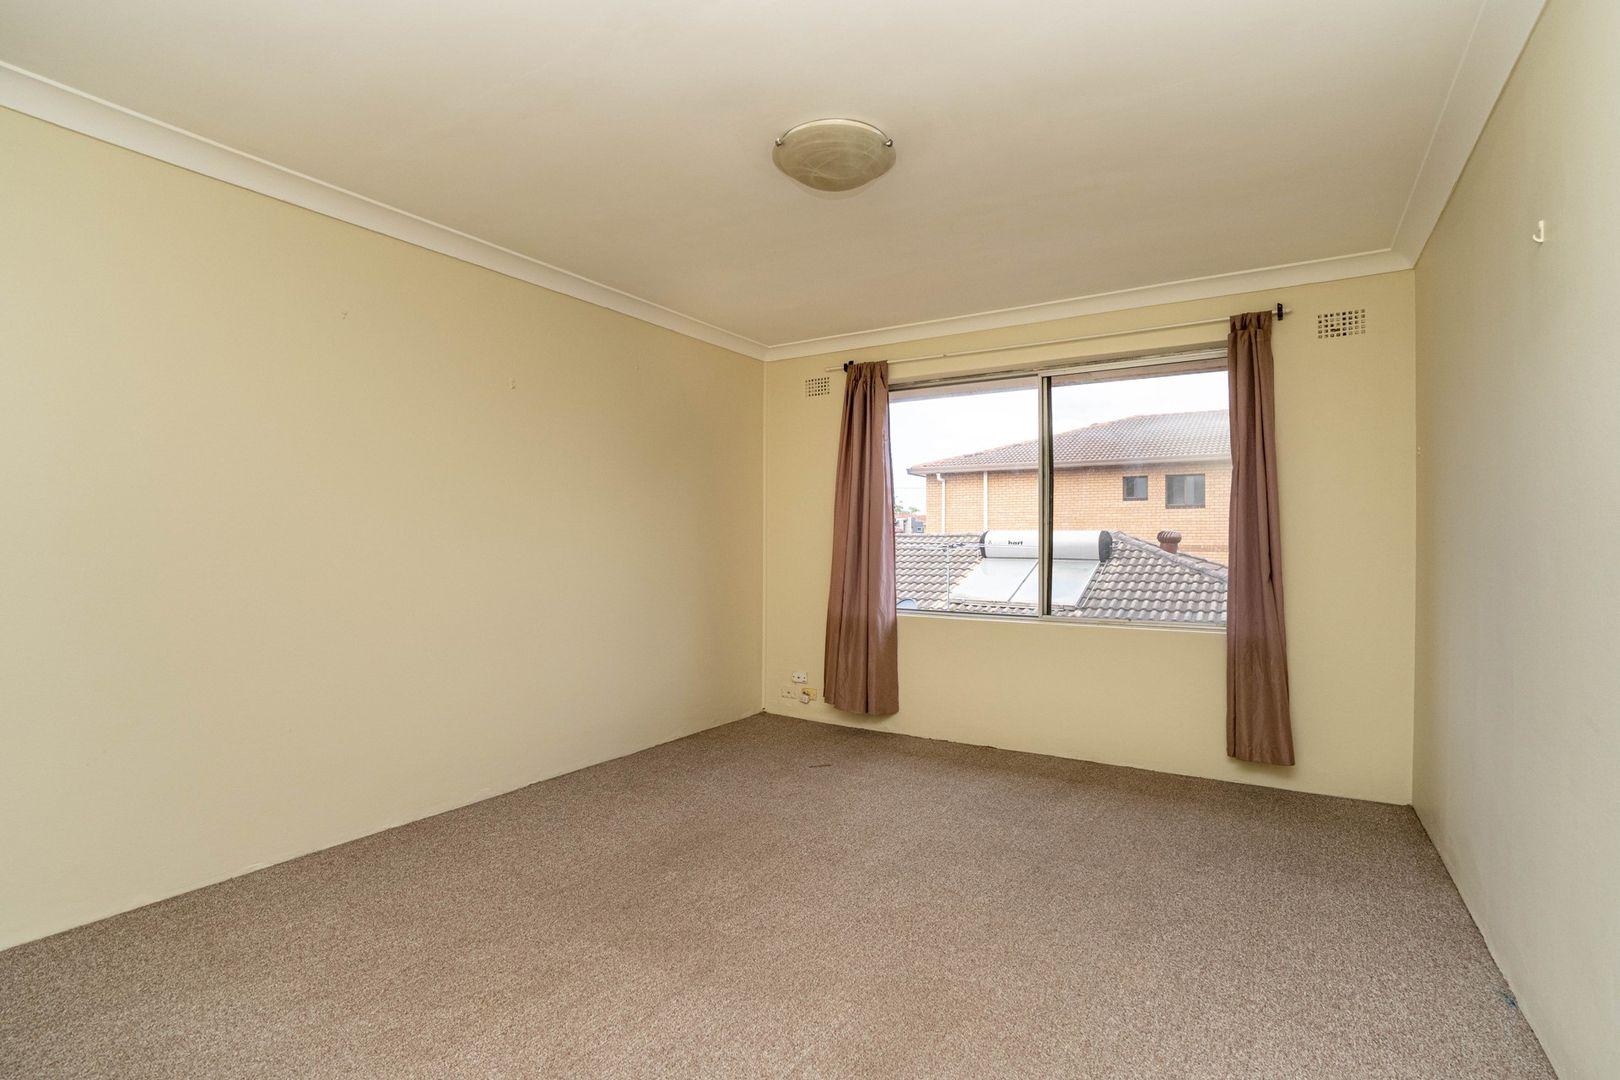 5/9 Ridgewell Street, Roselands NSW 2196, Image 2